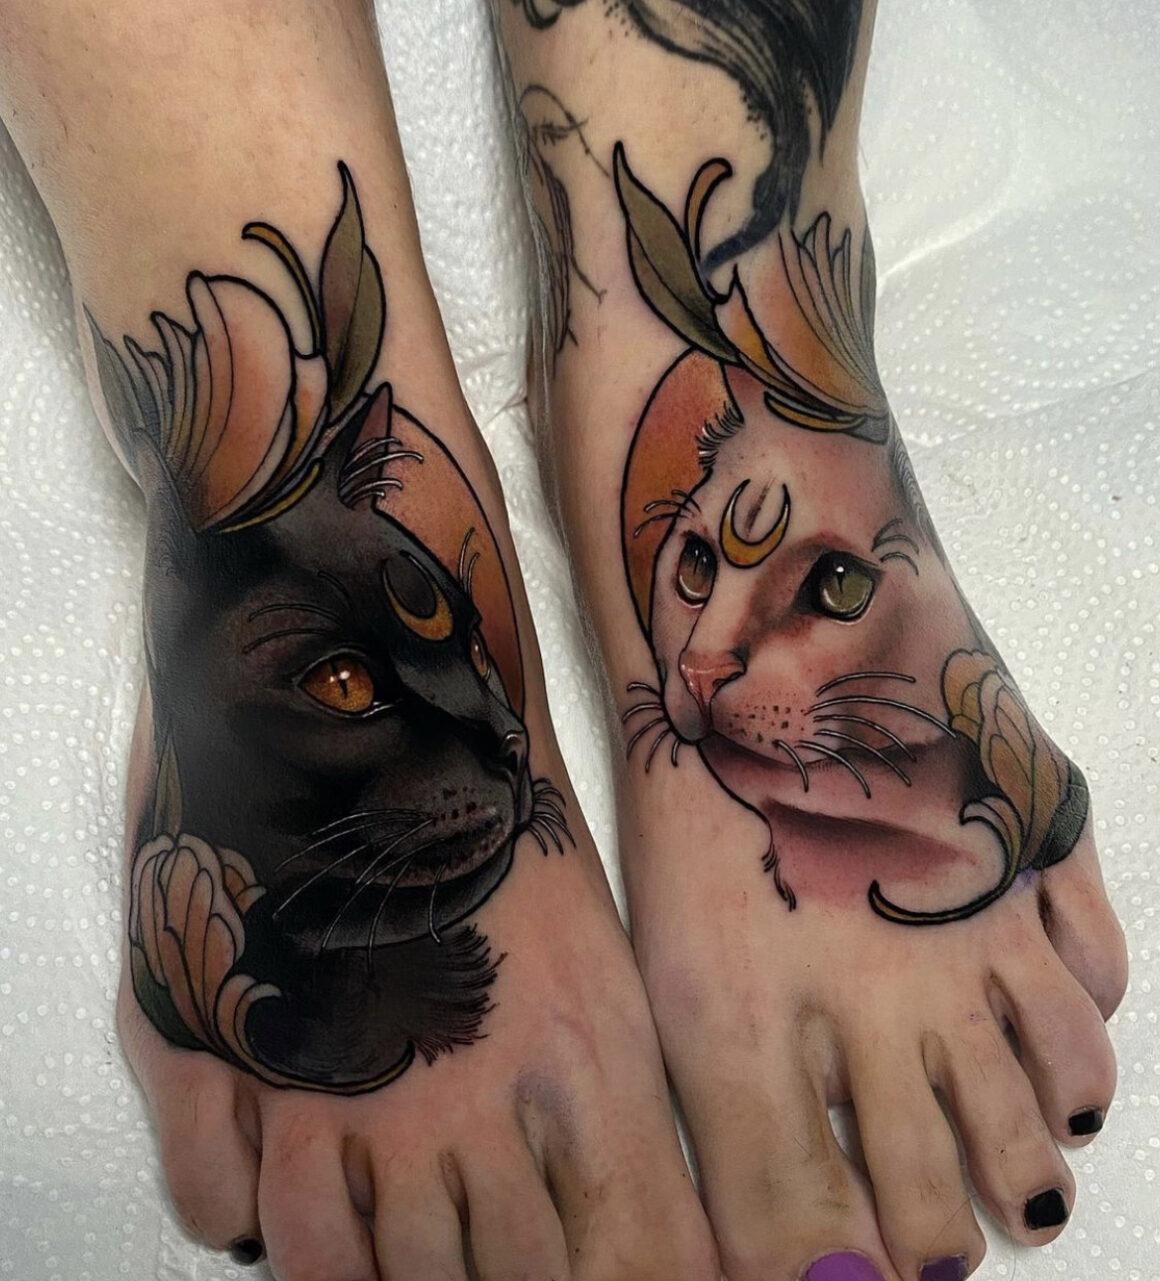 Raquel Escudero, Tattoo Freaks, Castelldefels, Spain